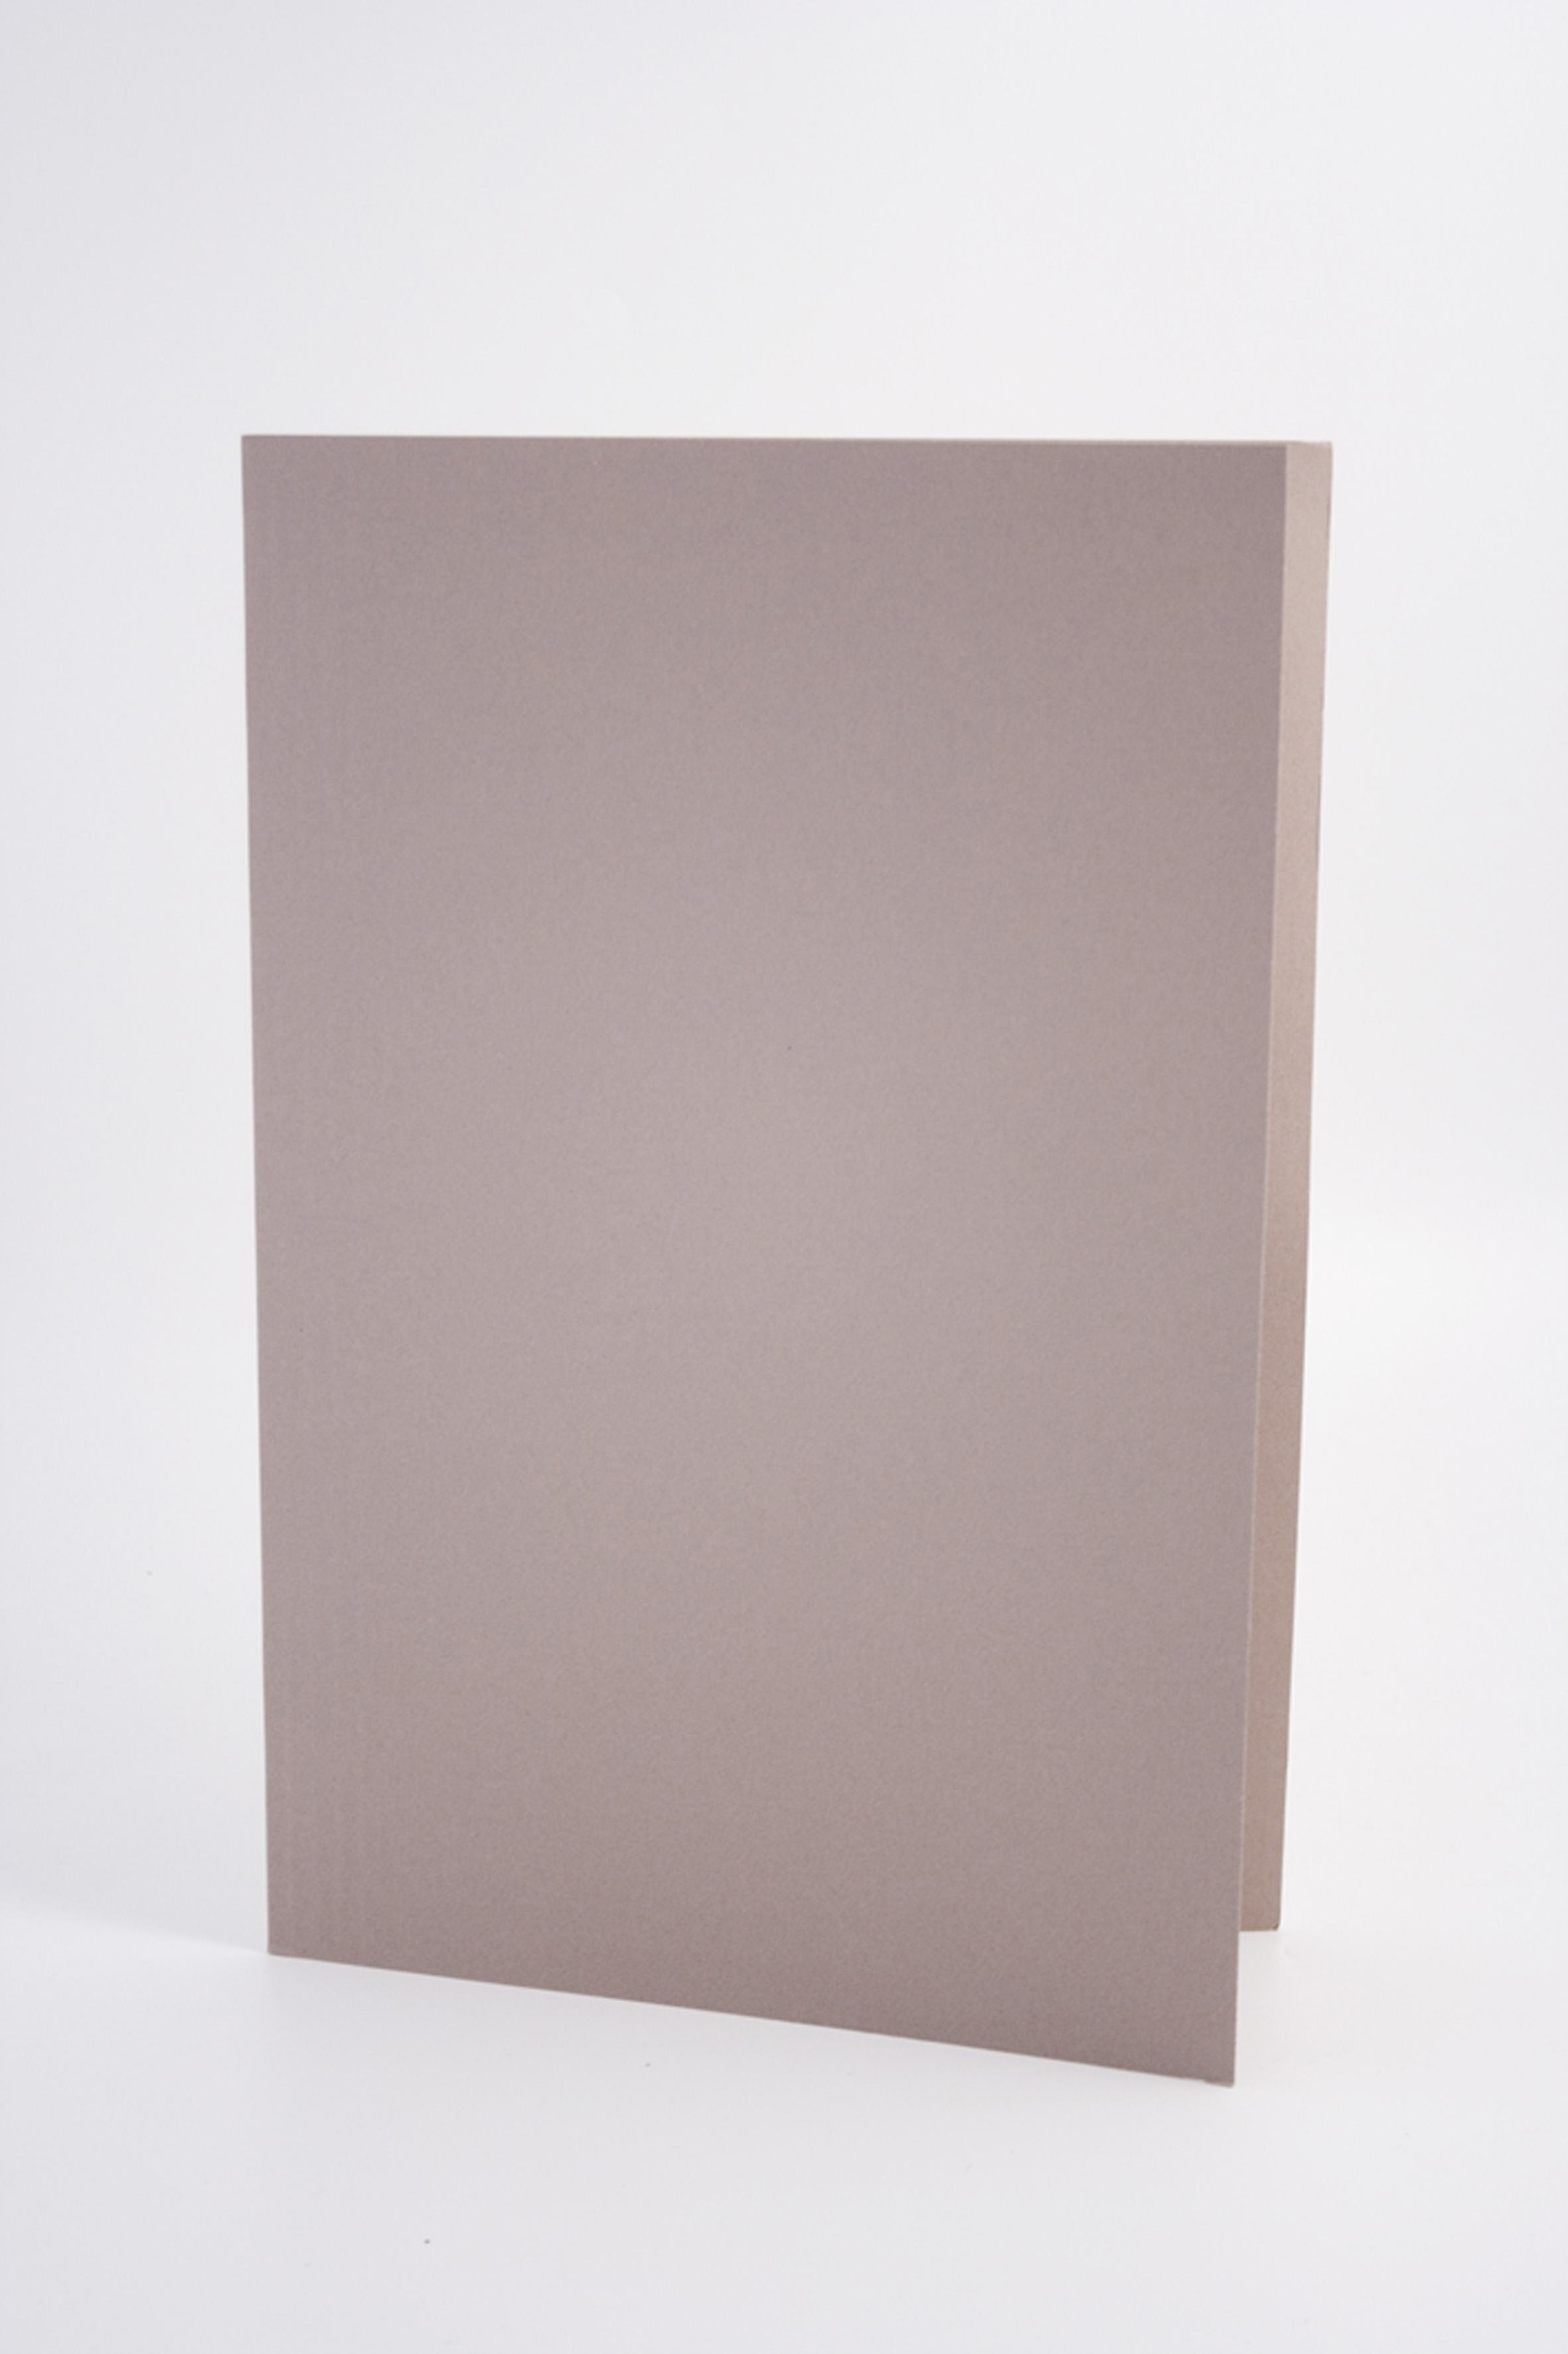 Guildhall Square Cut Folder Foolscap 180gsm Buff PK100